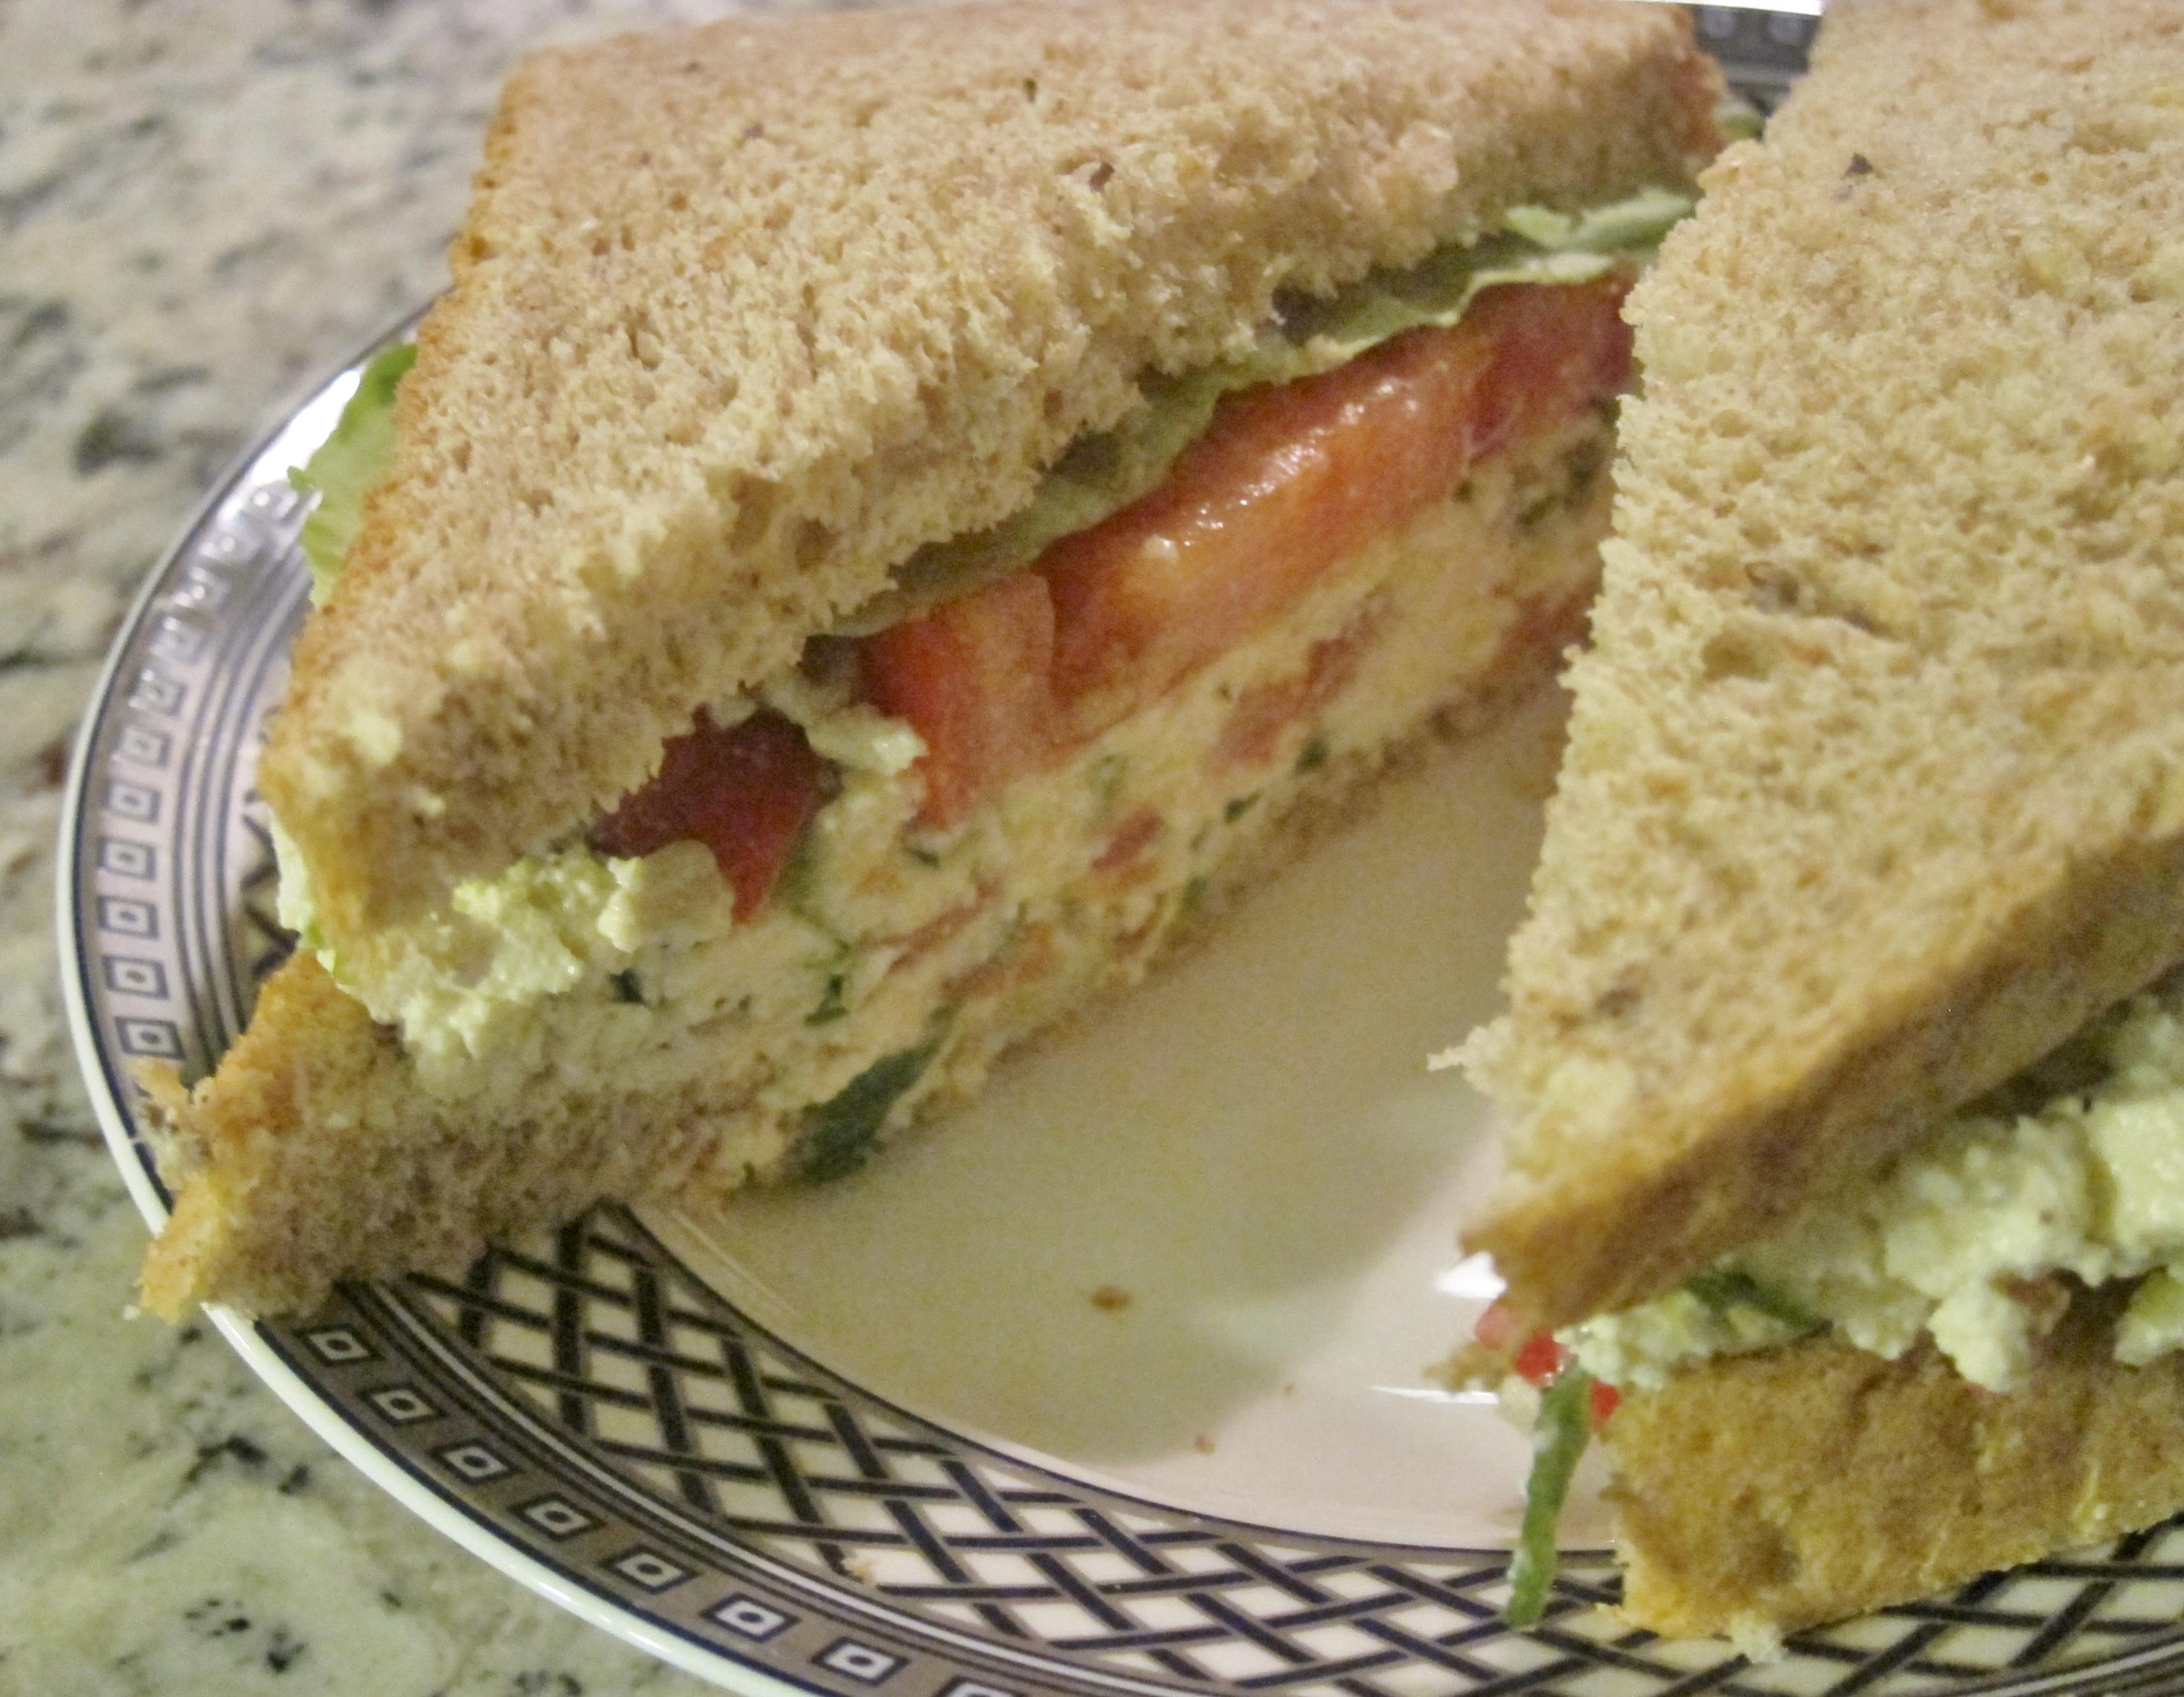 Garden Patch Sandwiches on Multigrain Bread | Vegan Chronicle